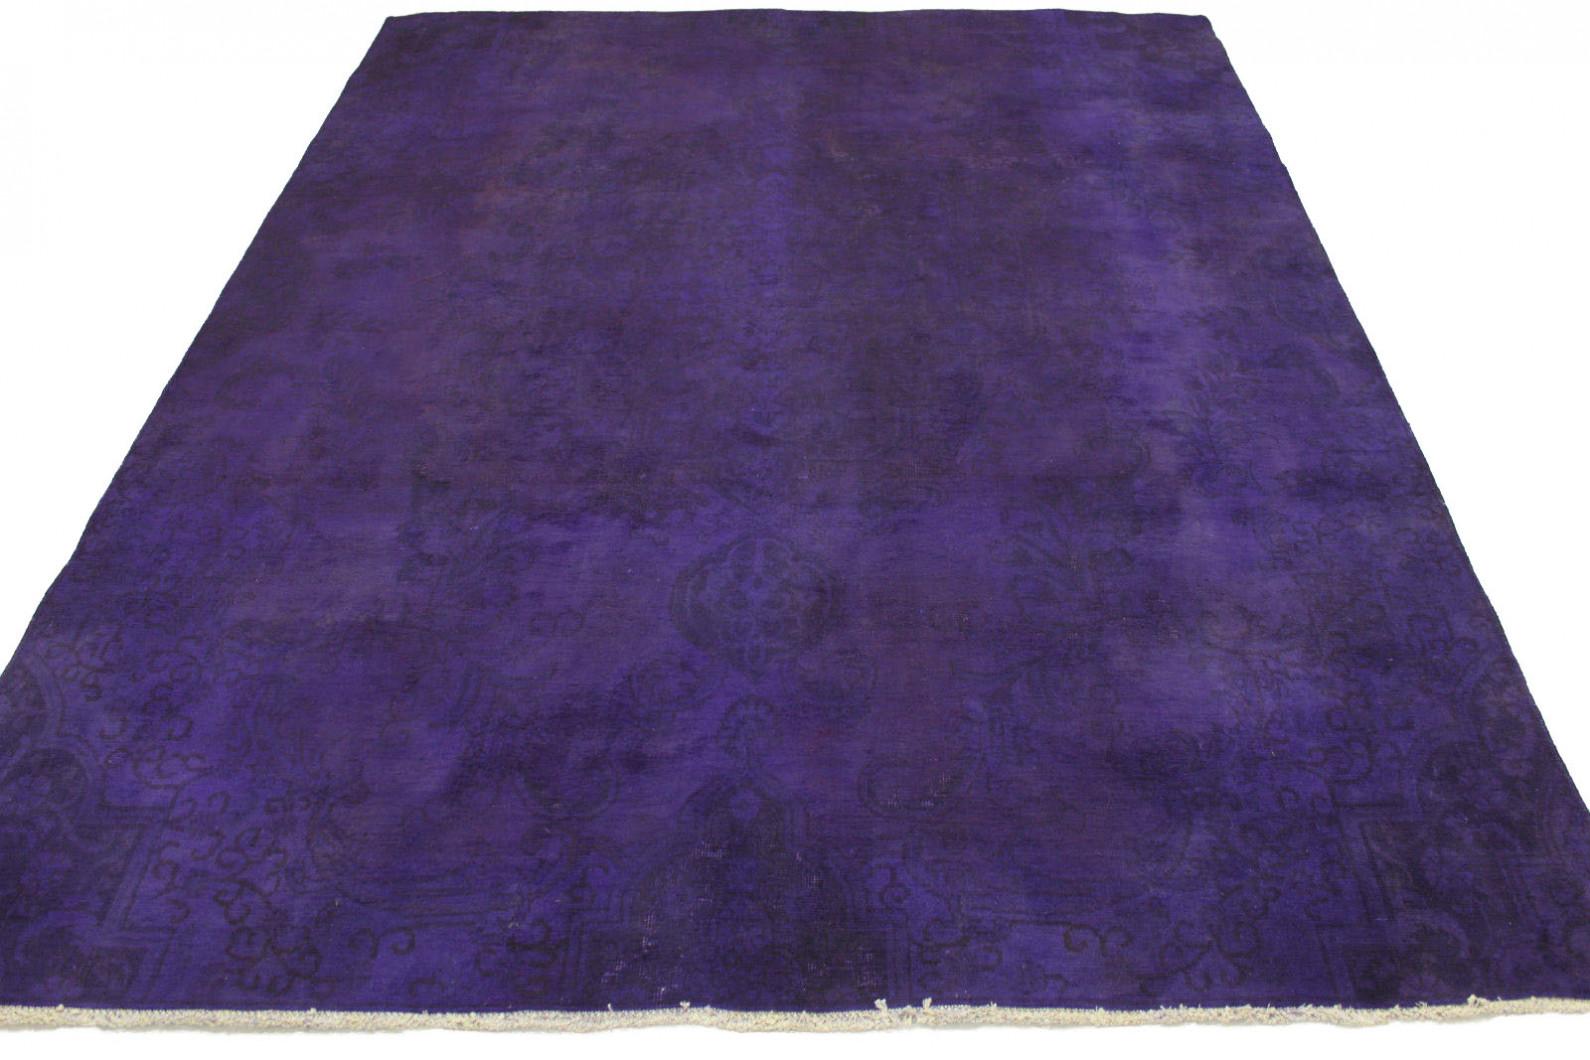 vintage teppich lila in 300x210cm 1001 3139 bei kaufen. Black Bedroom Furniture Sets. Home Design Ideas